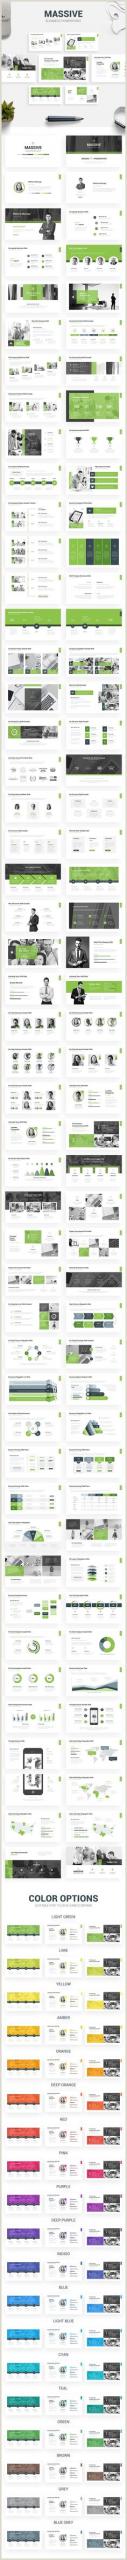 Best Business Cards In Northwest Indiana 10 Best Business Card Design